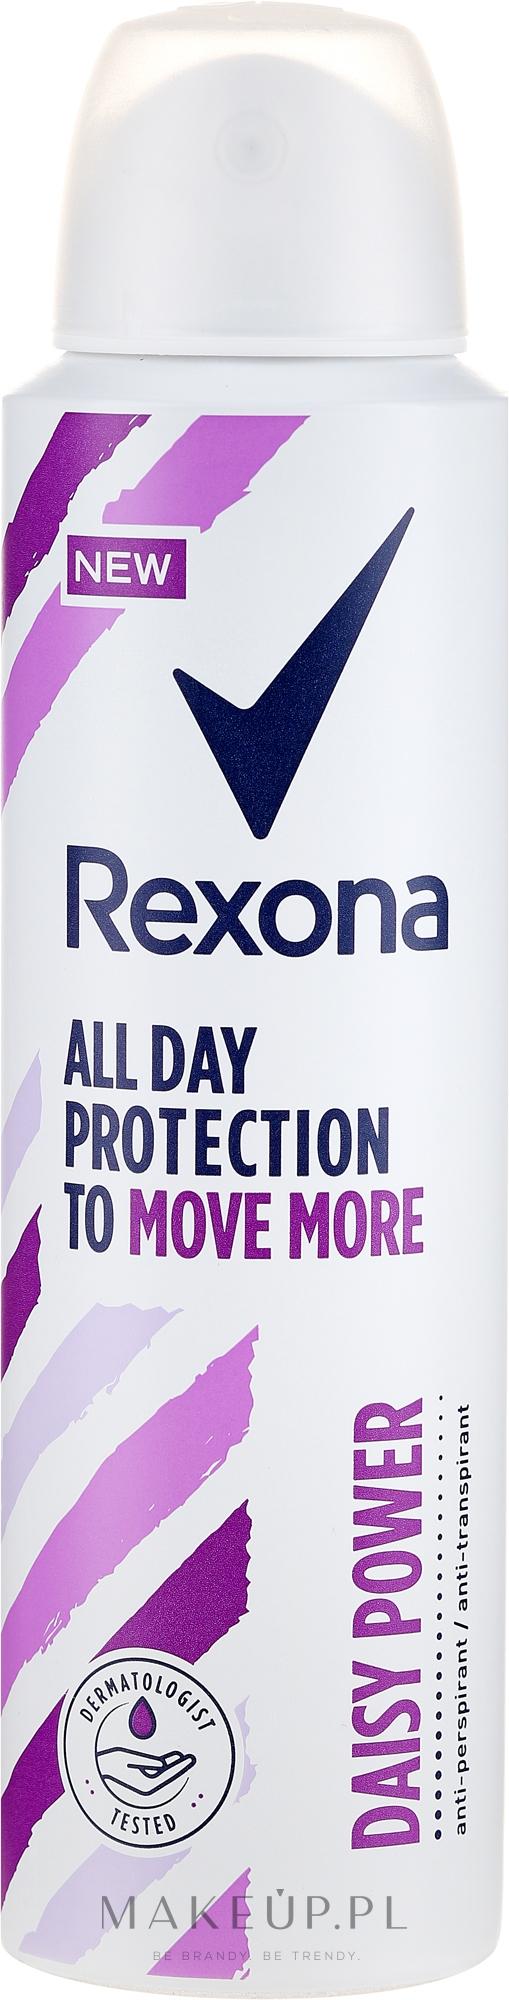 Antyperspirant w sprayu - Rexona Daisy Power Antiperspirant Deodorant — фото 150 ml